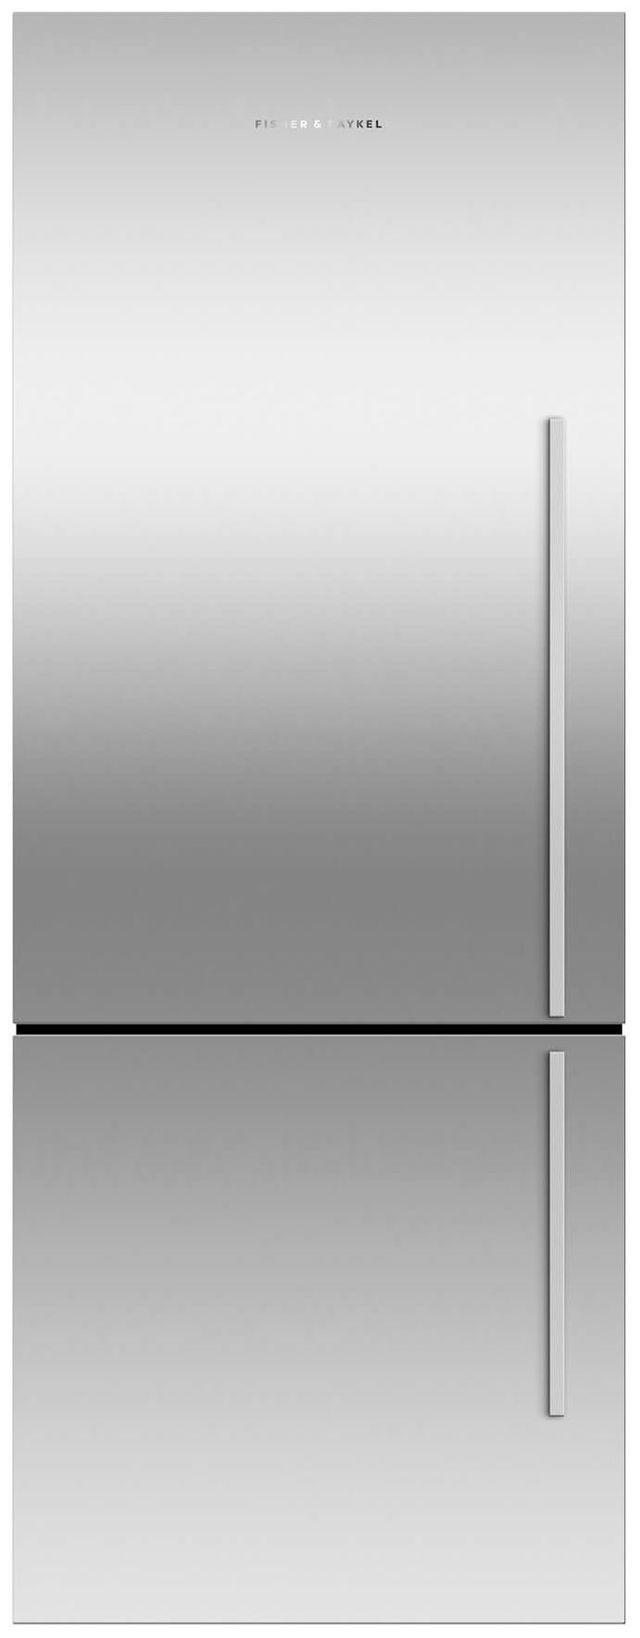 Fisher & Paykel 13.4 Cu. Ft. EZKleen Stainless Steel Counter Depth Bottom Freezer Refrigerator-RF135BDLX4 N